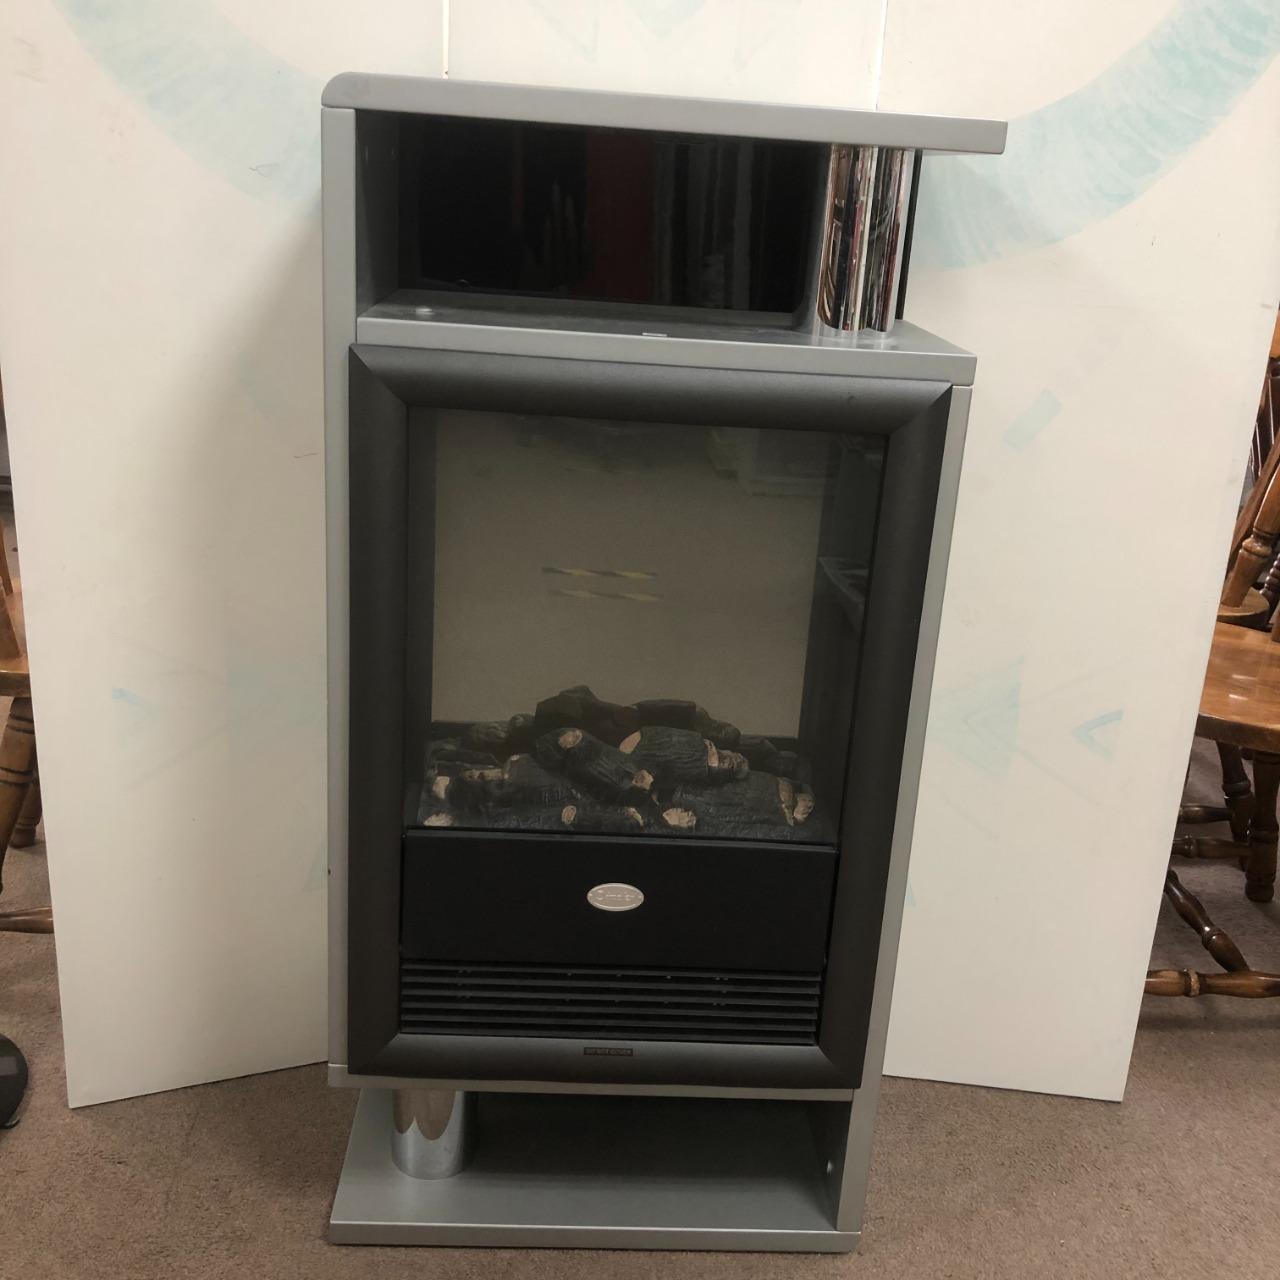 Dimplex 1800-2000W Electric Fire Place